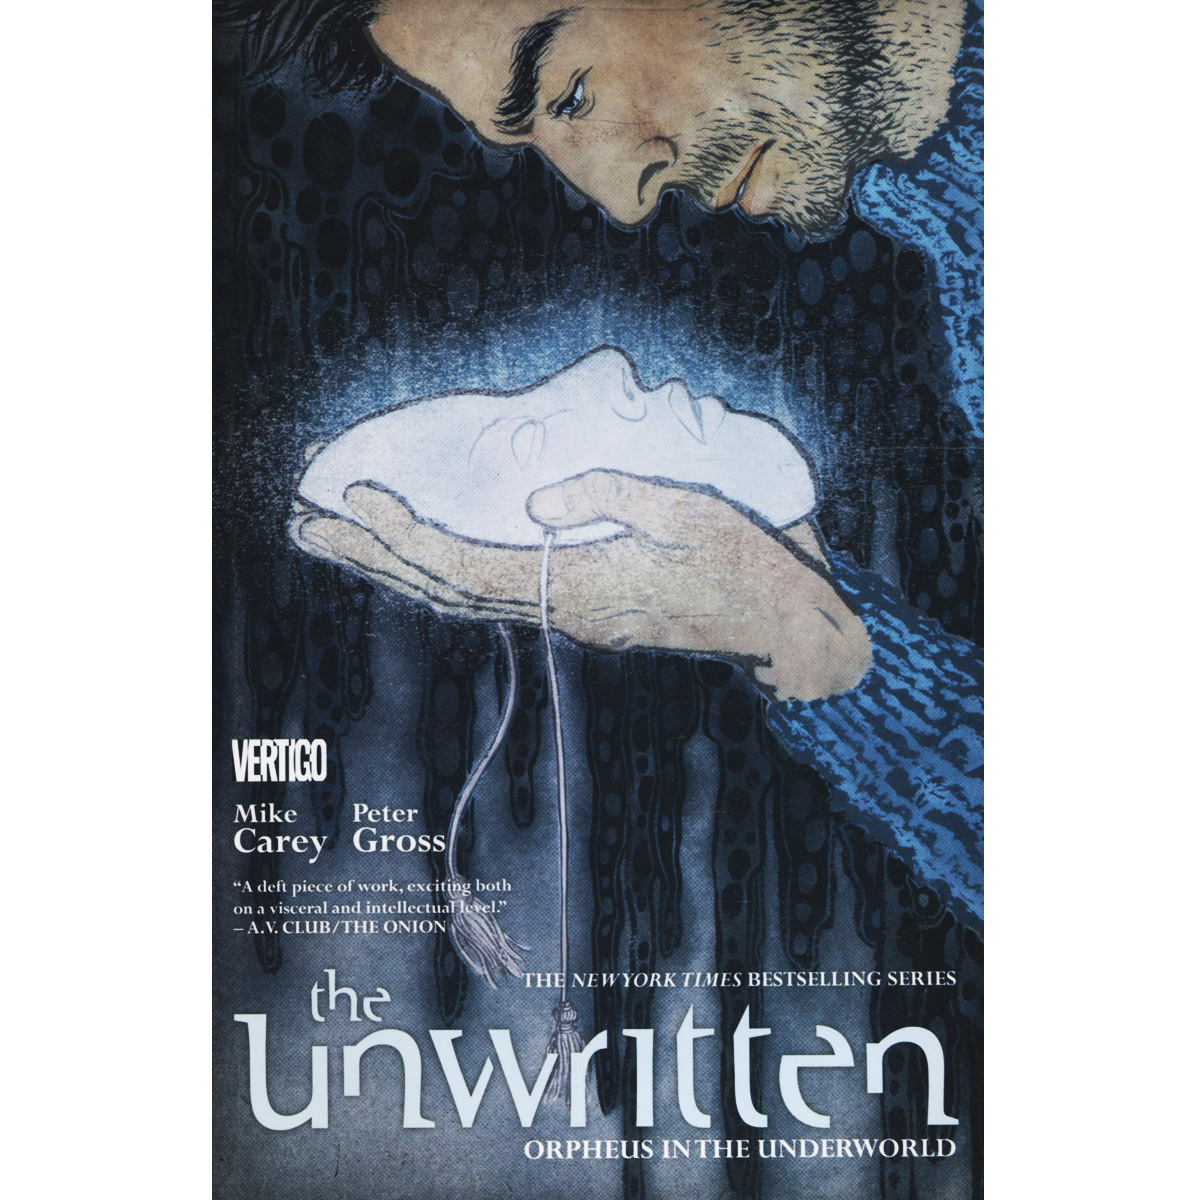 The Unwritten: vol. 8: Orpheus in the Underworld